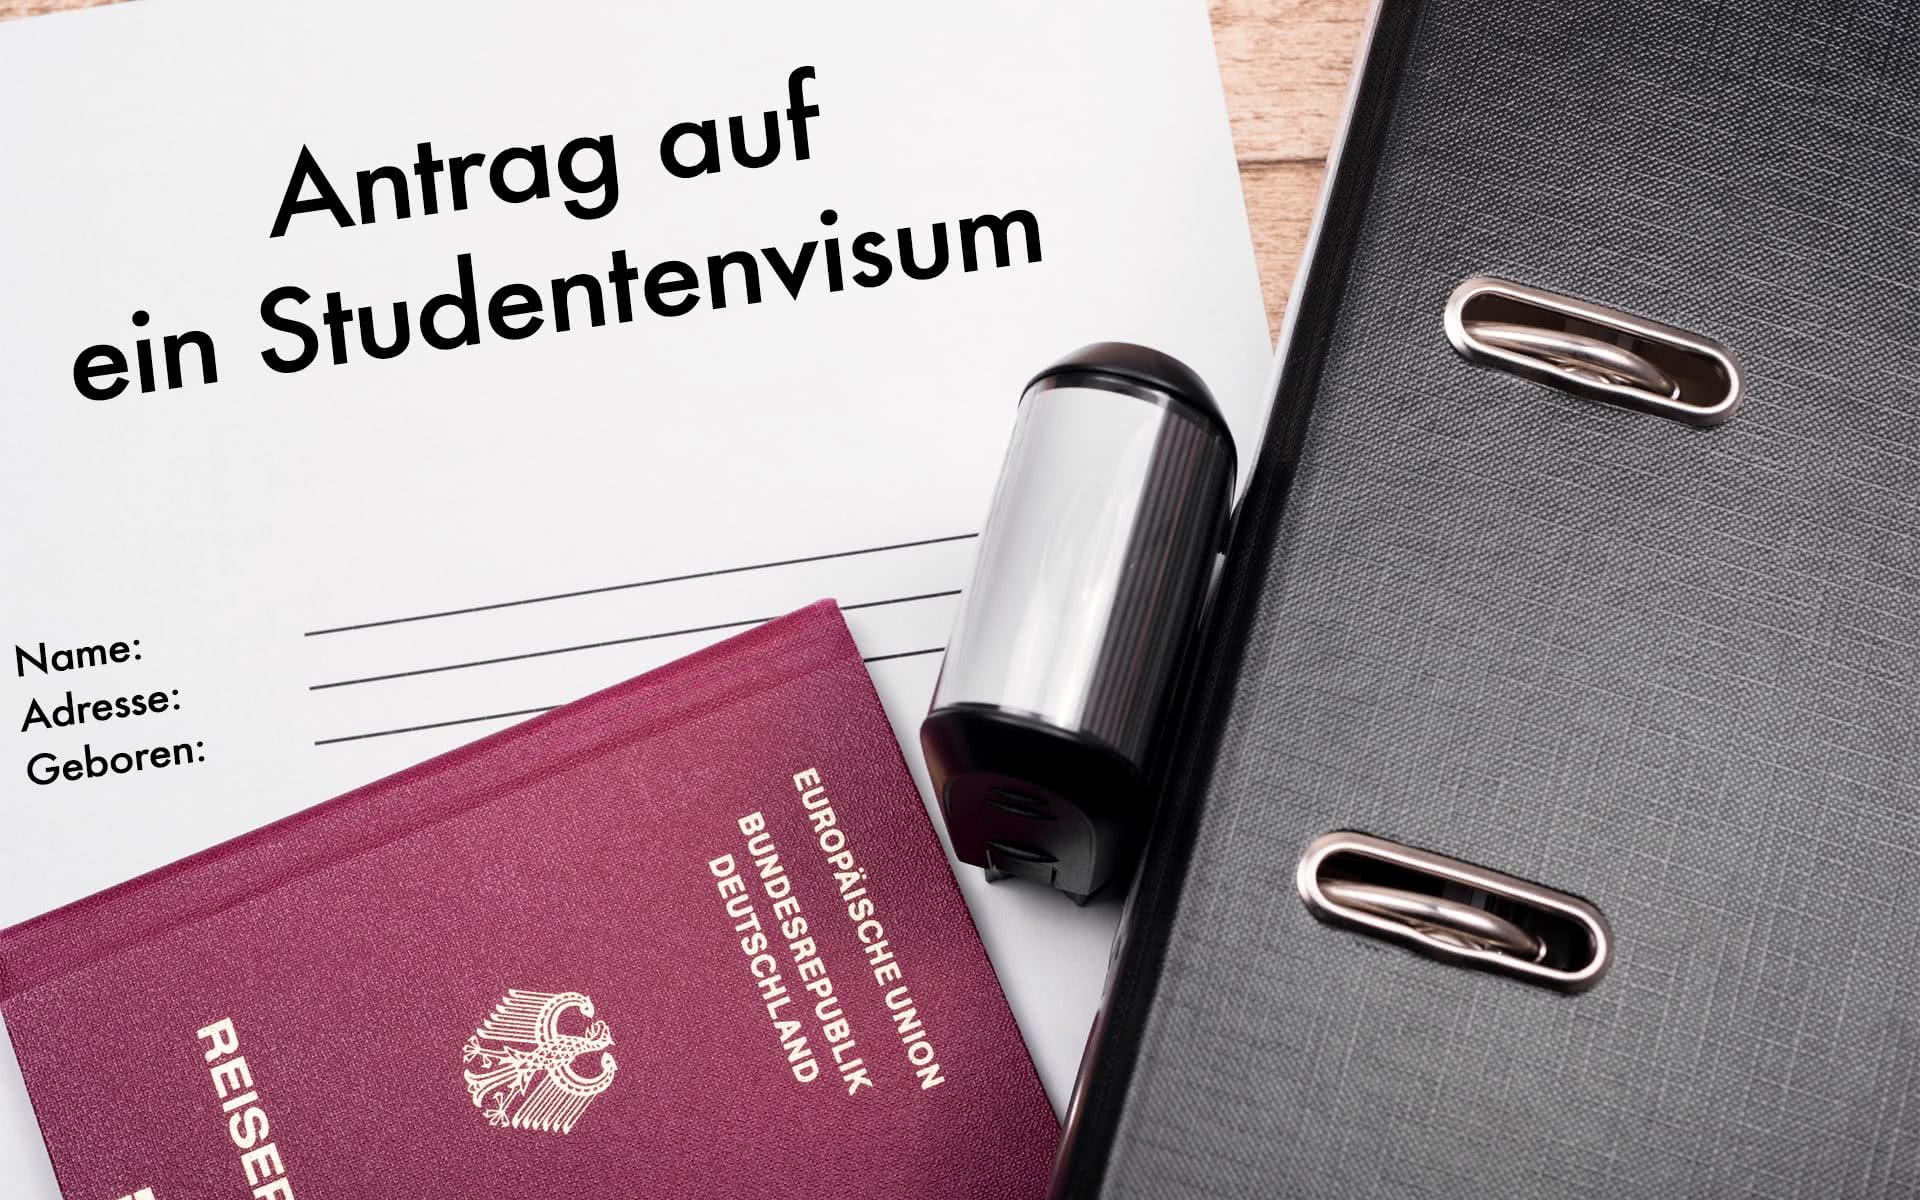 academy studium visum 01 - Do I need a student visa for Germany?